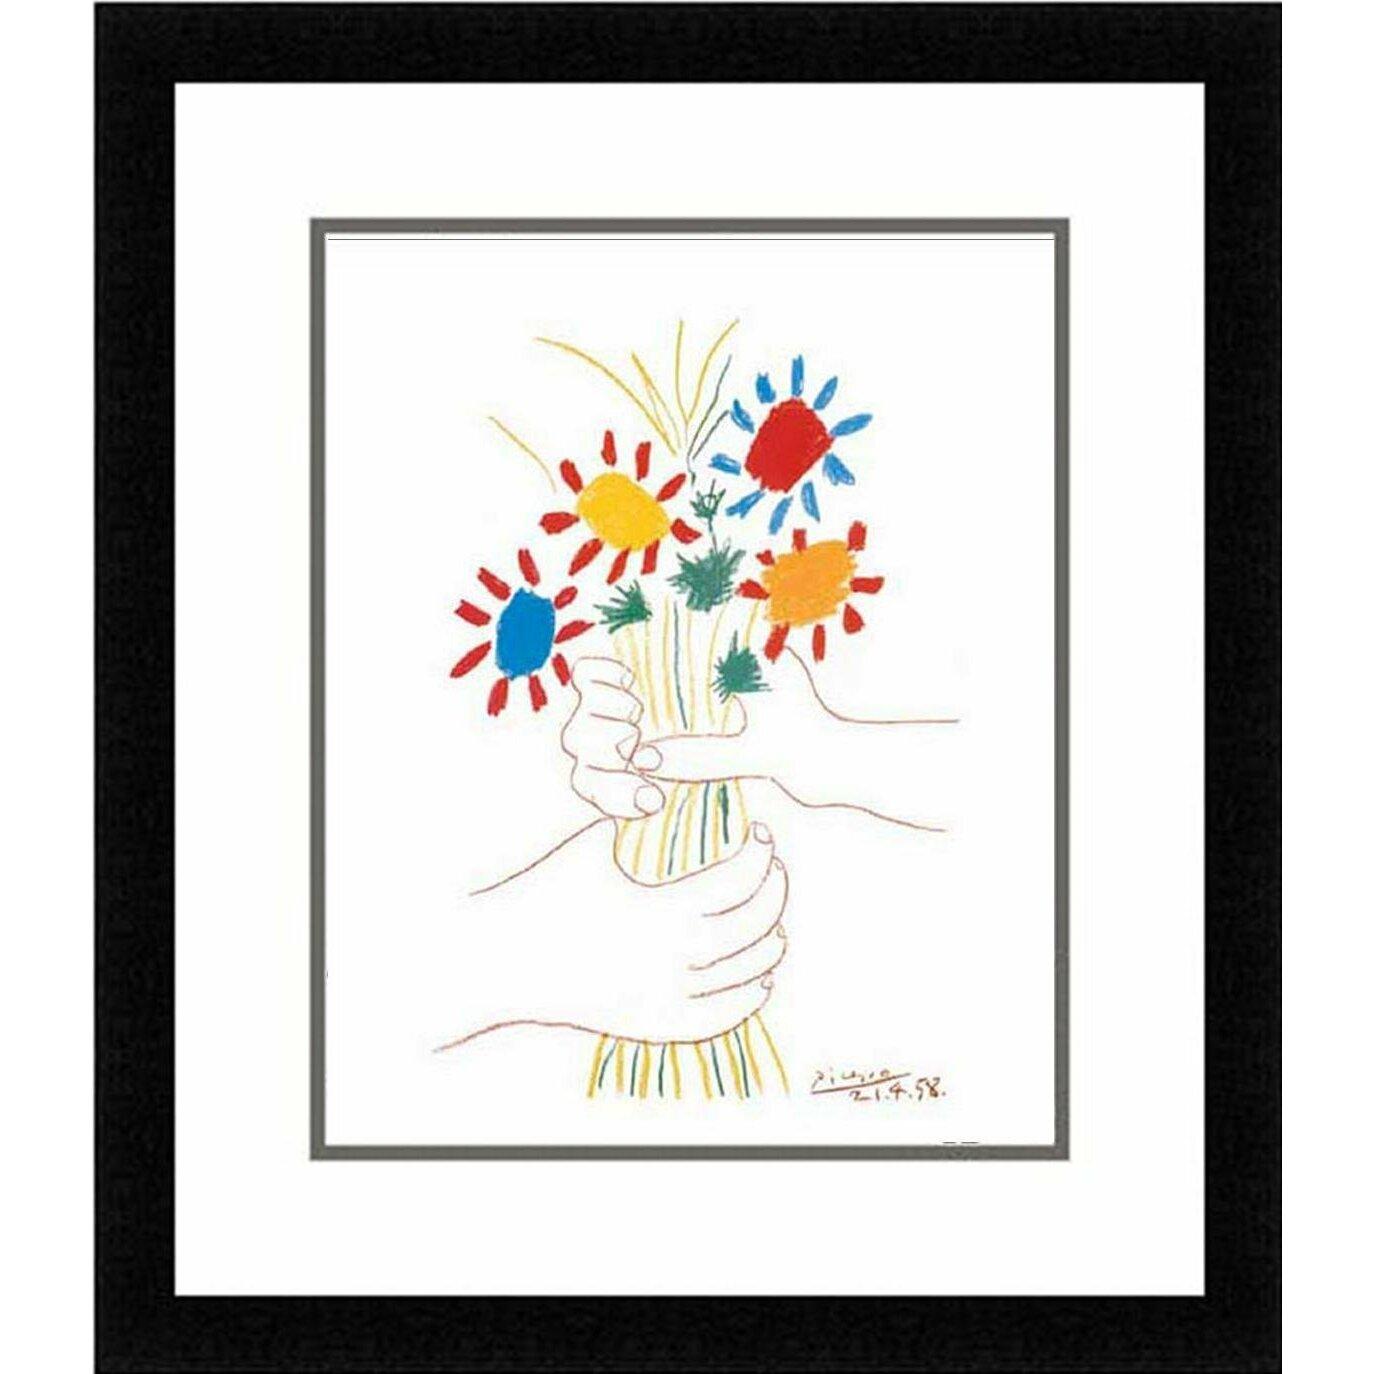 Buy art for less petite fleurs by pablo picasso framed for Picasso petite fleurs